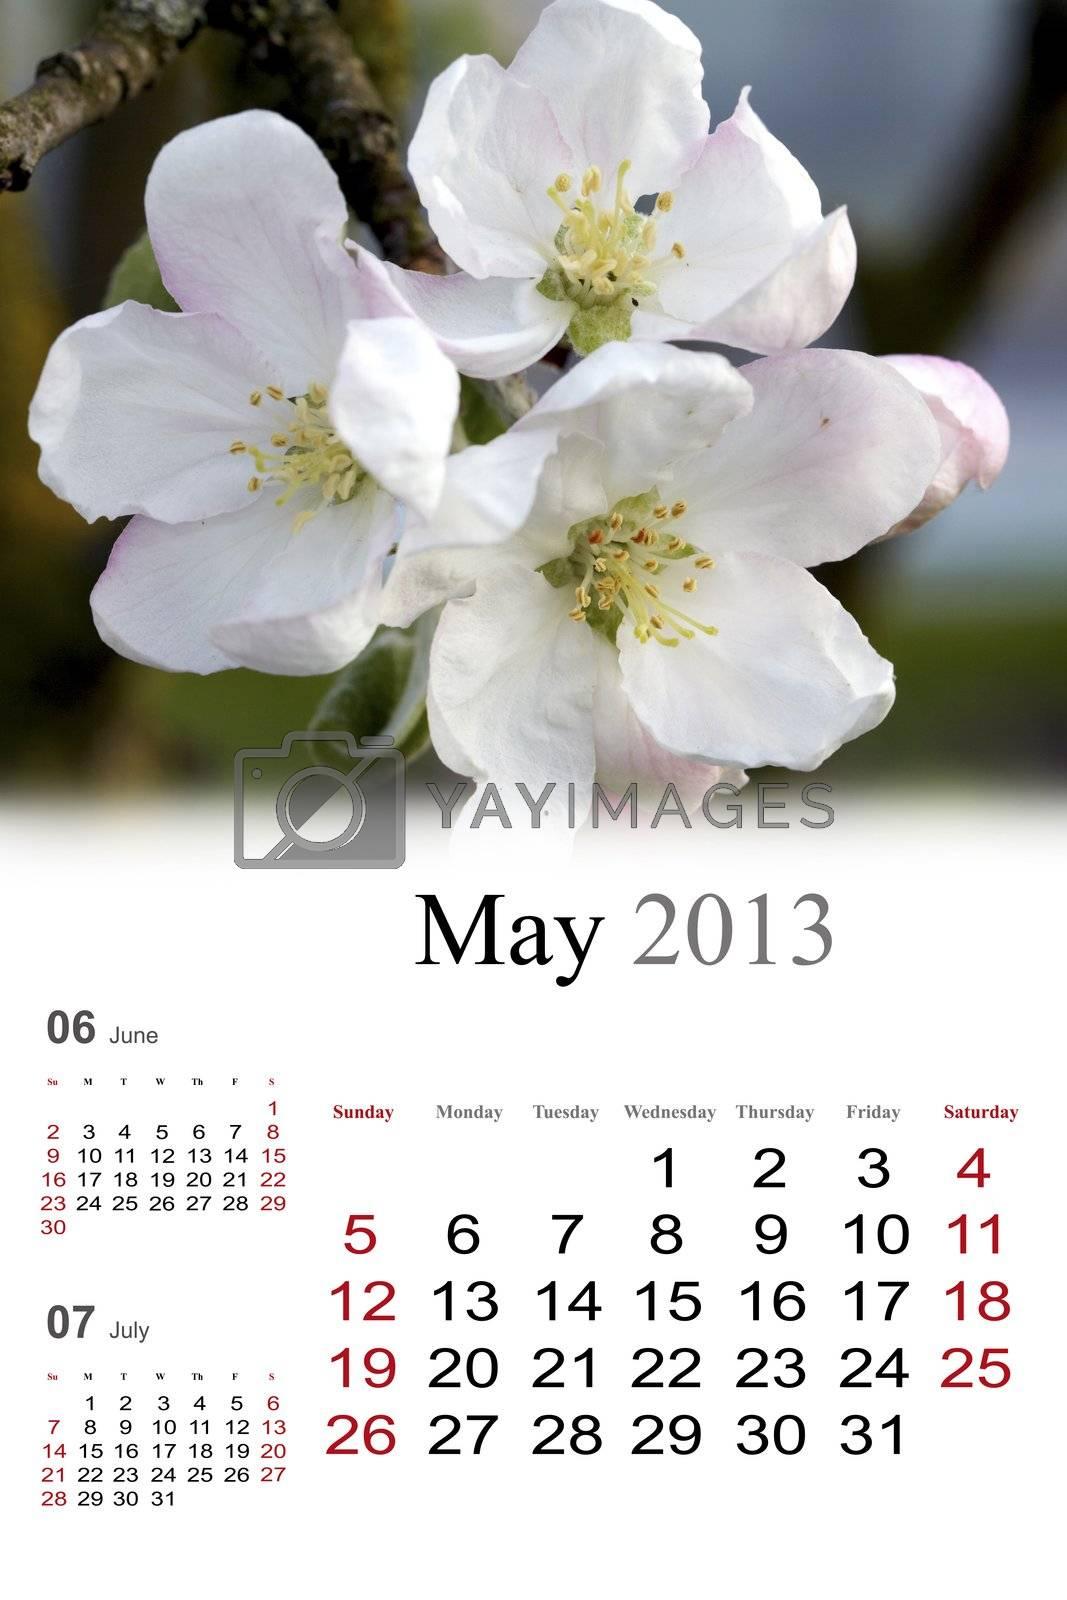 2013 Calendar. May by Nikonas